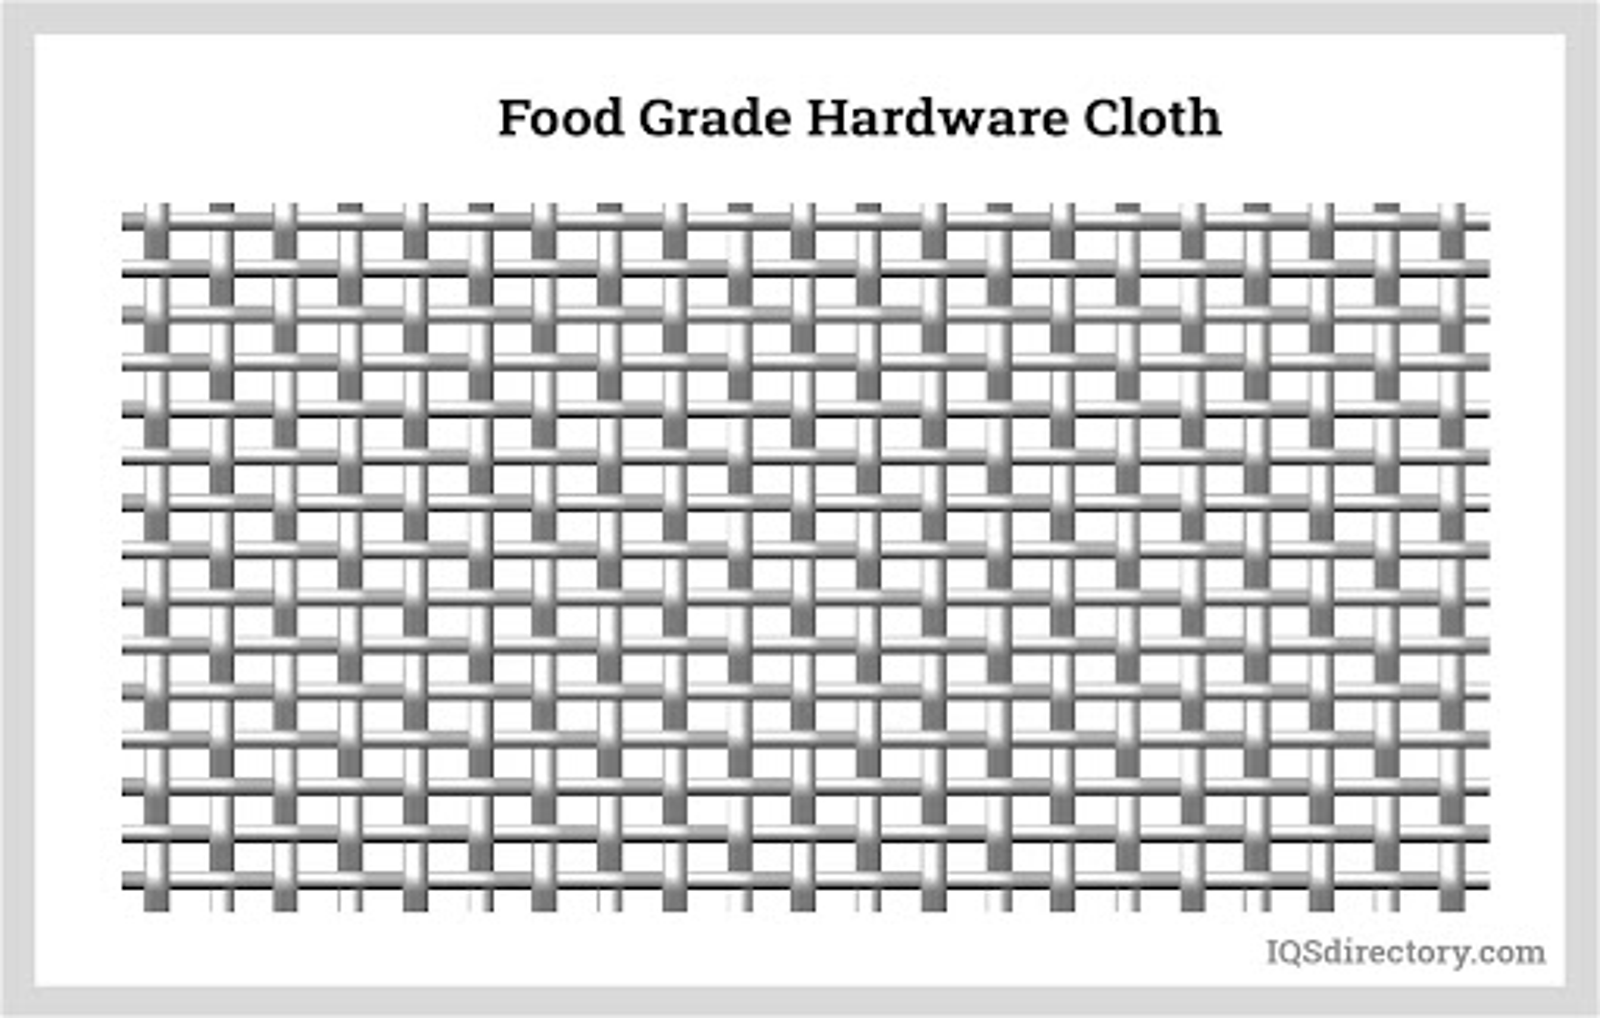 Food Grade Hardware Cloth